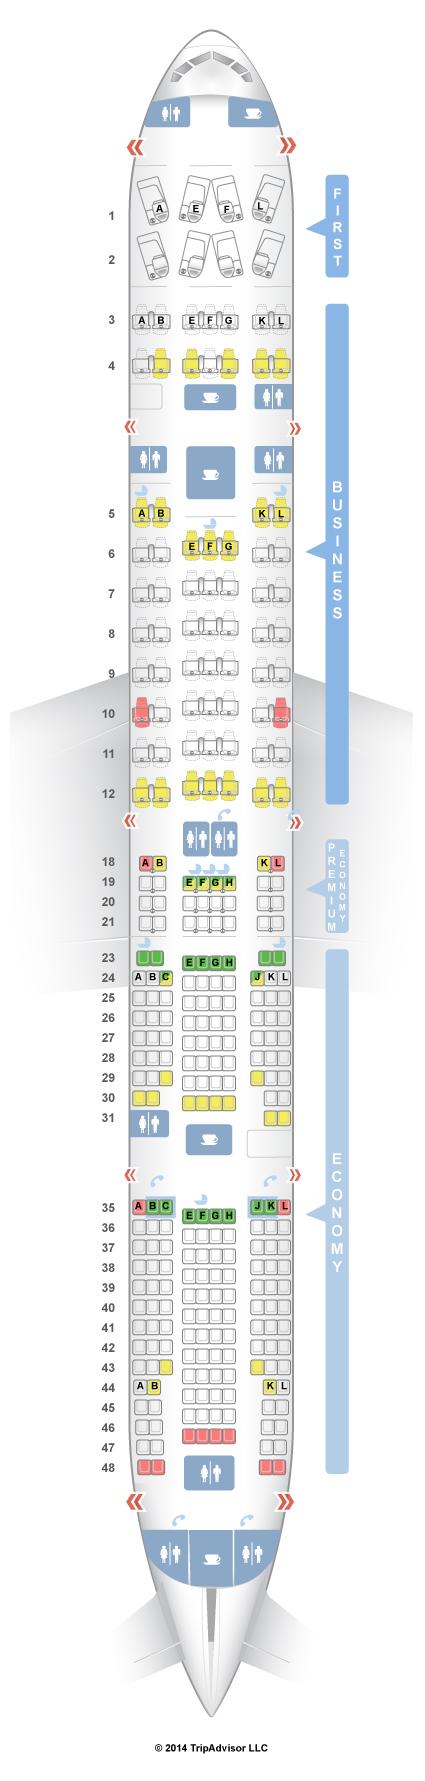 Seatguru Seat Map Air France Boeing 777 300er 77w Four Class